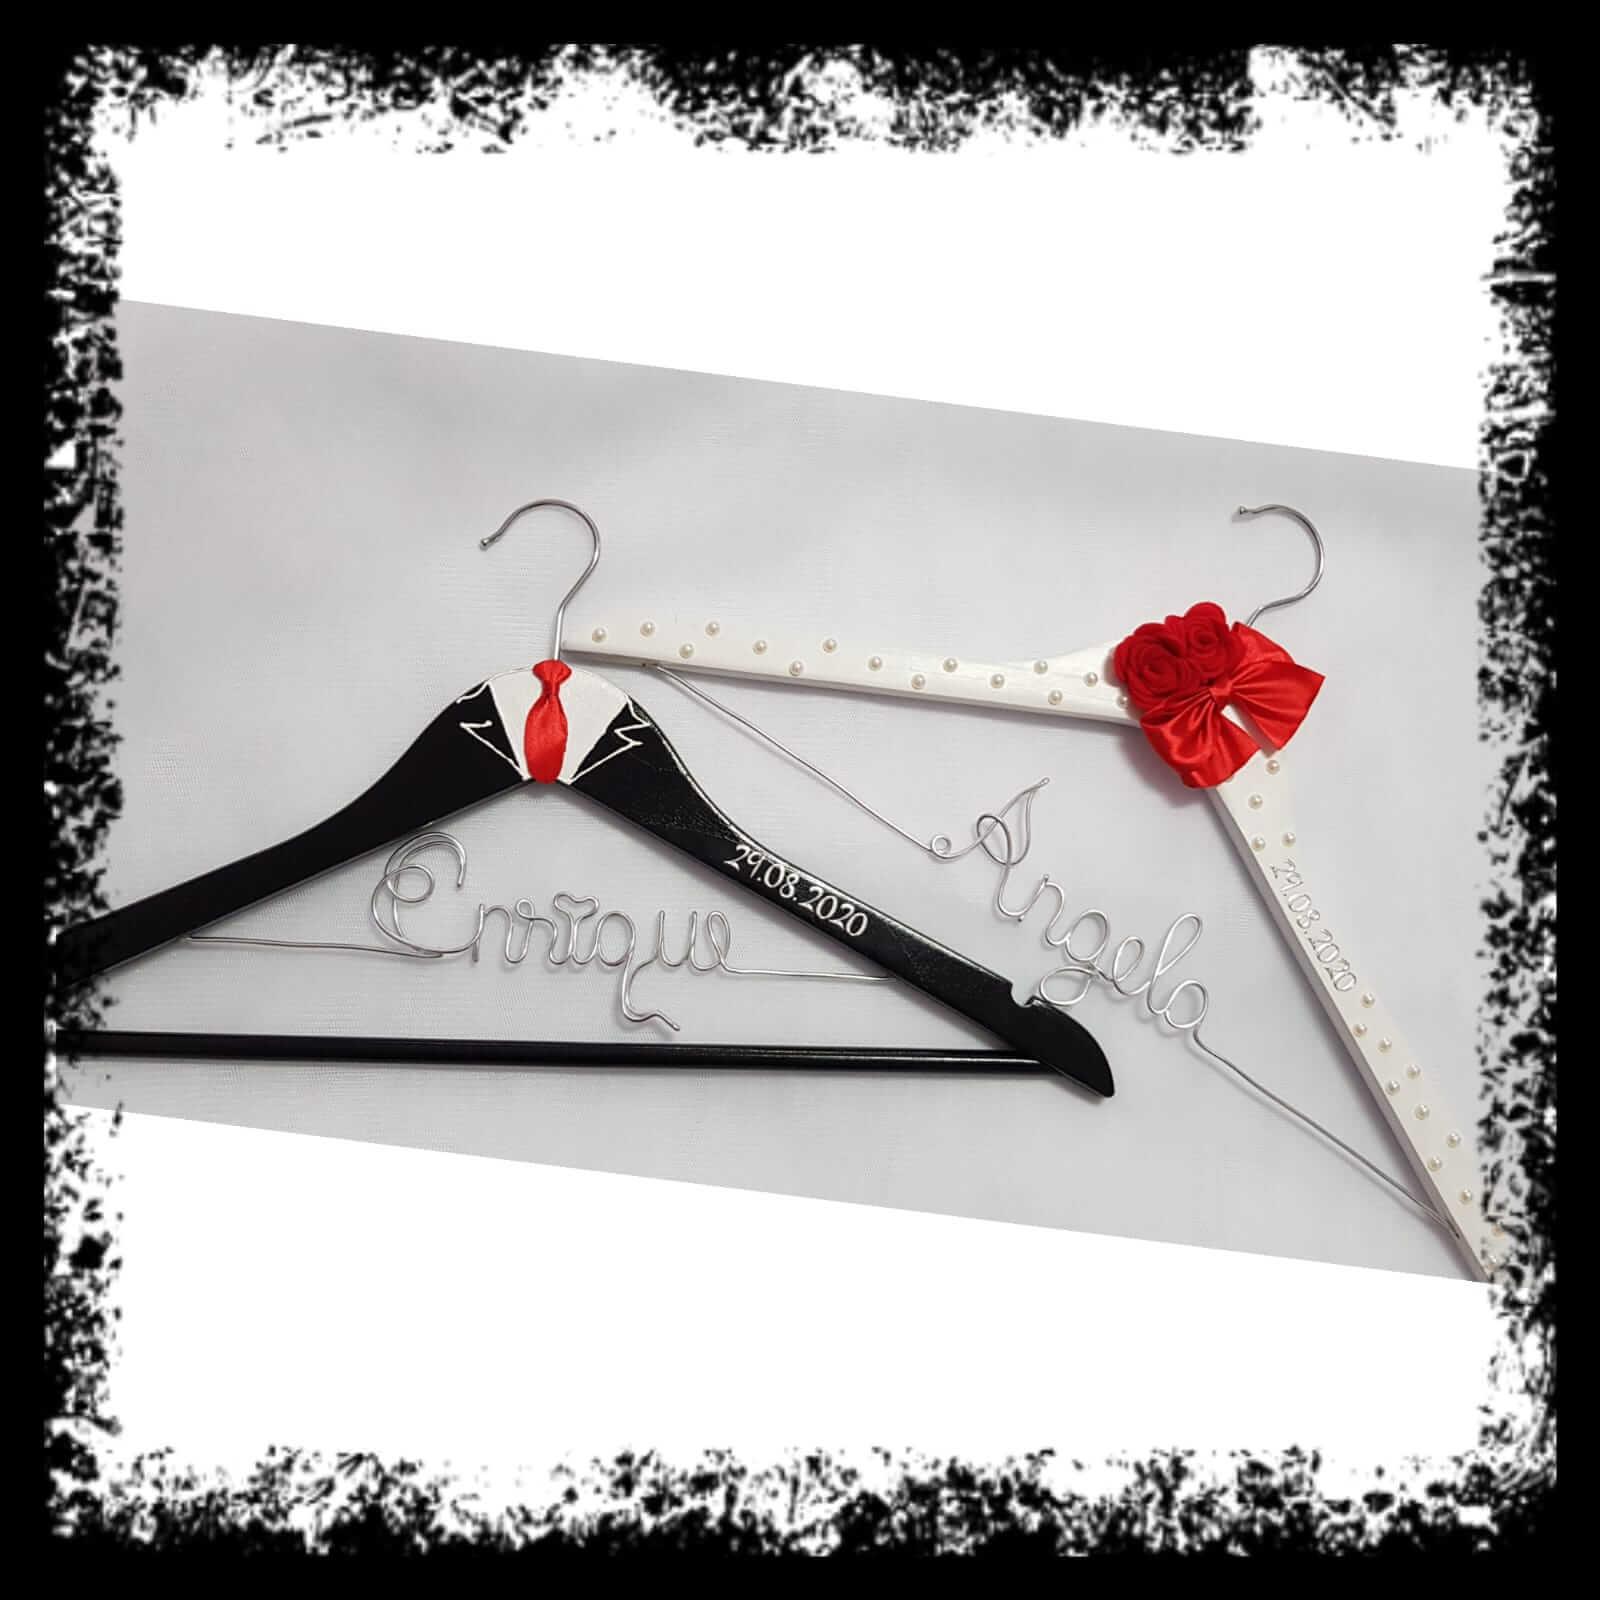 perchas personalizadas perchas personalizadas - perchas personalizadas perchas novios detalles boda 1 - Perchas personalizadas | perchas novios | perchas personalizadas boda